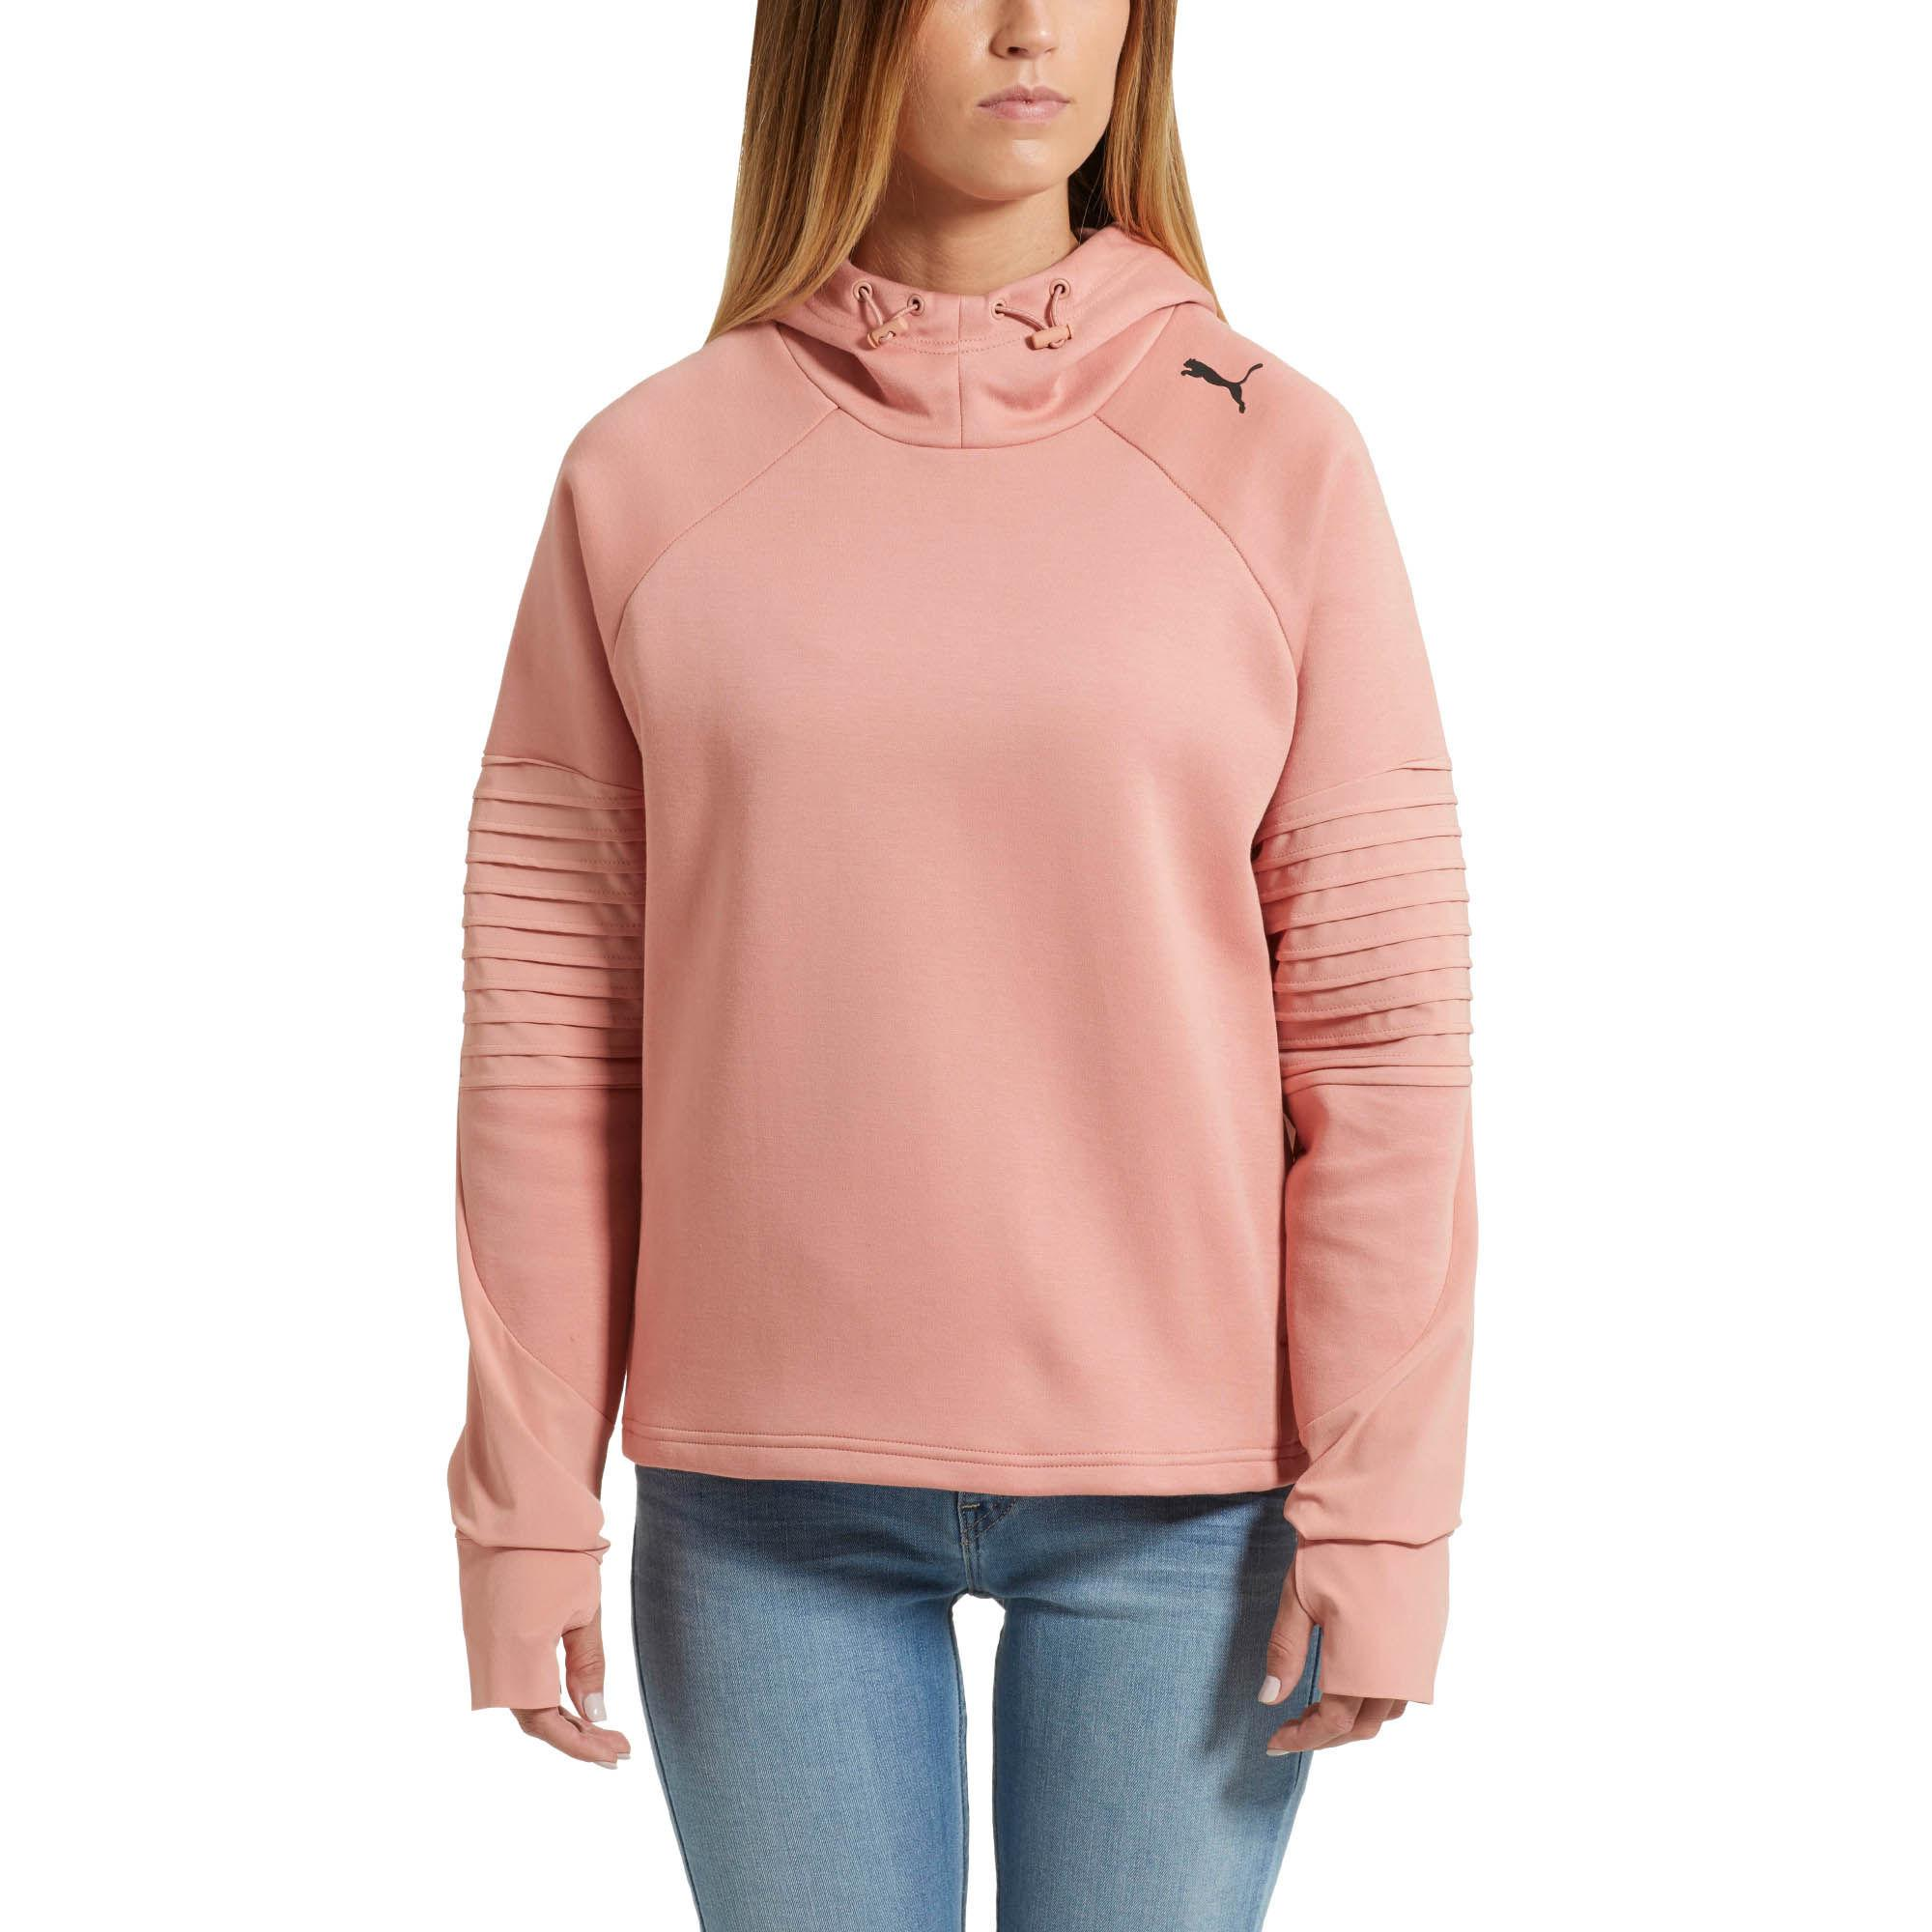 81c0cd22f6 PUMA Pink Evostripe Hoodie